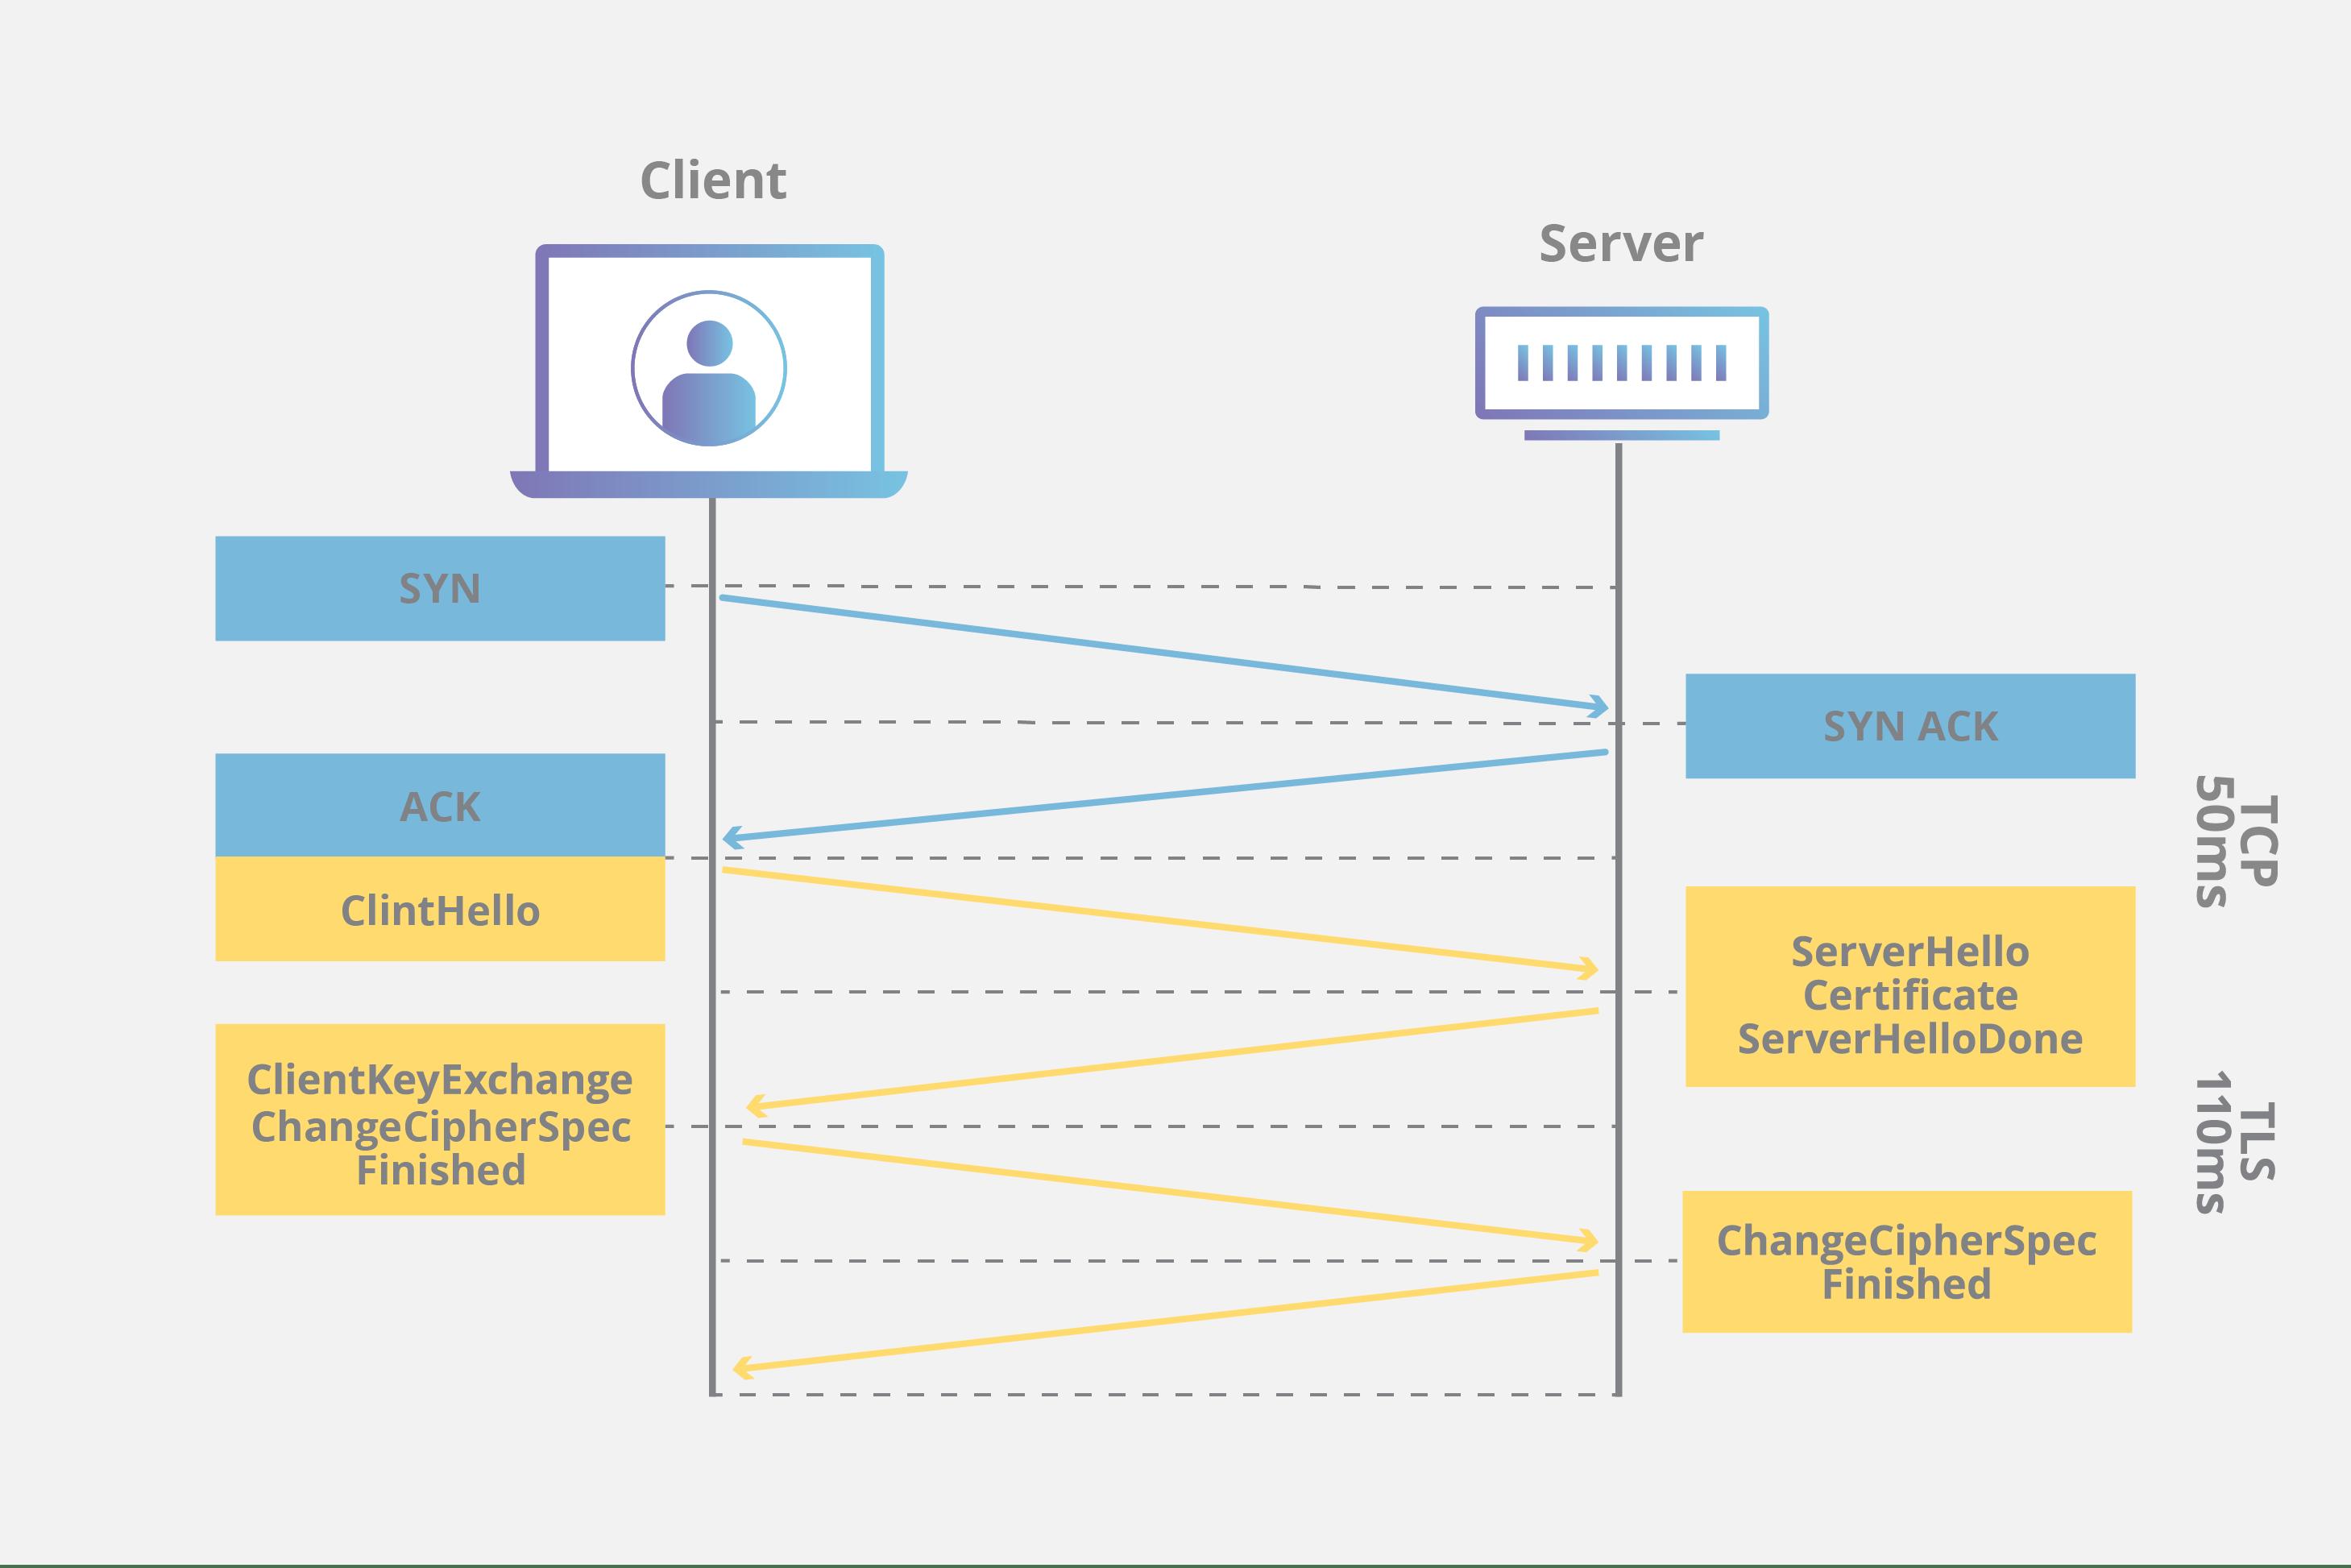 tcp three way handshake diagram 1998 ford ranger 4x4 wiring cdn ssl tls security cloudflare